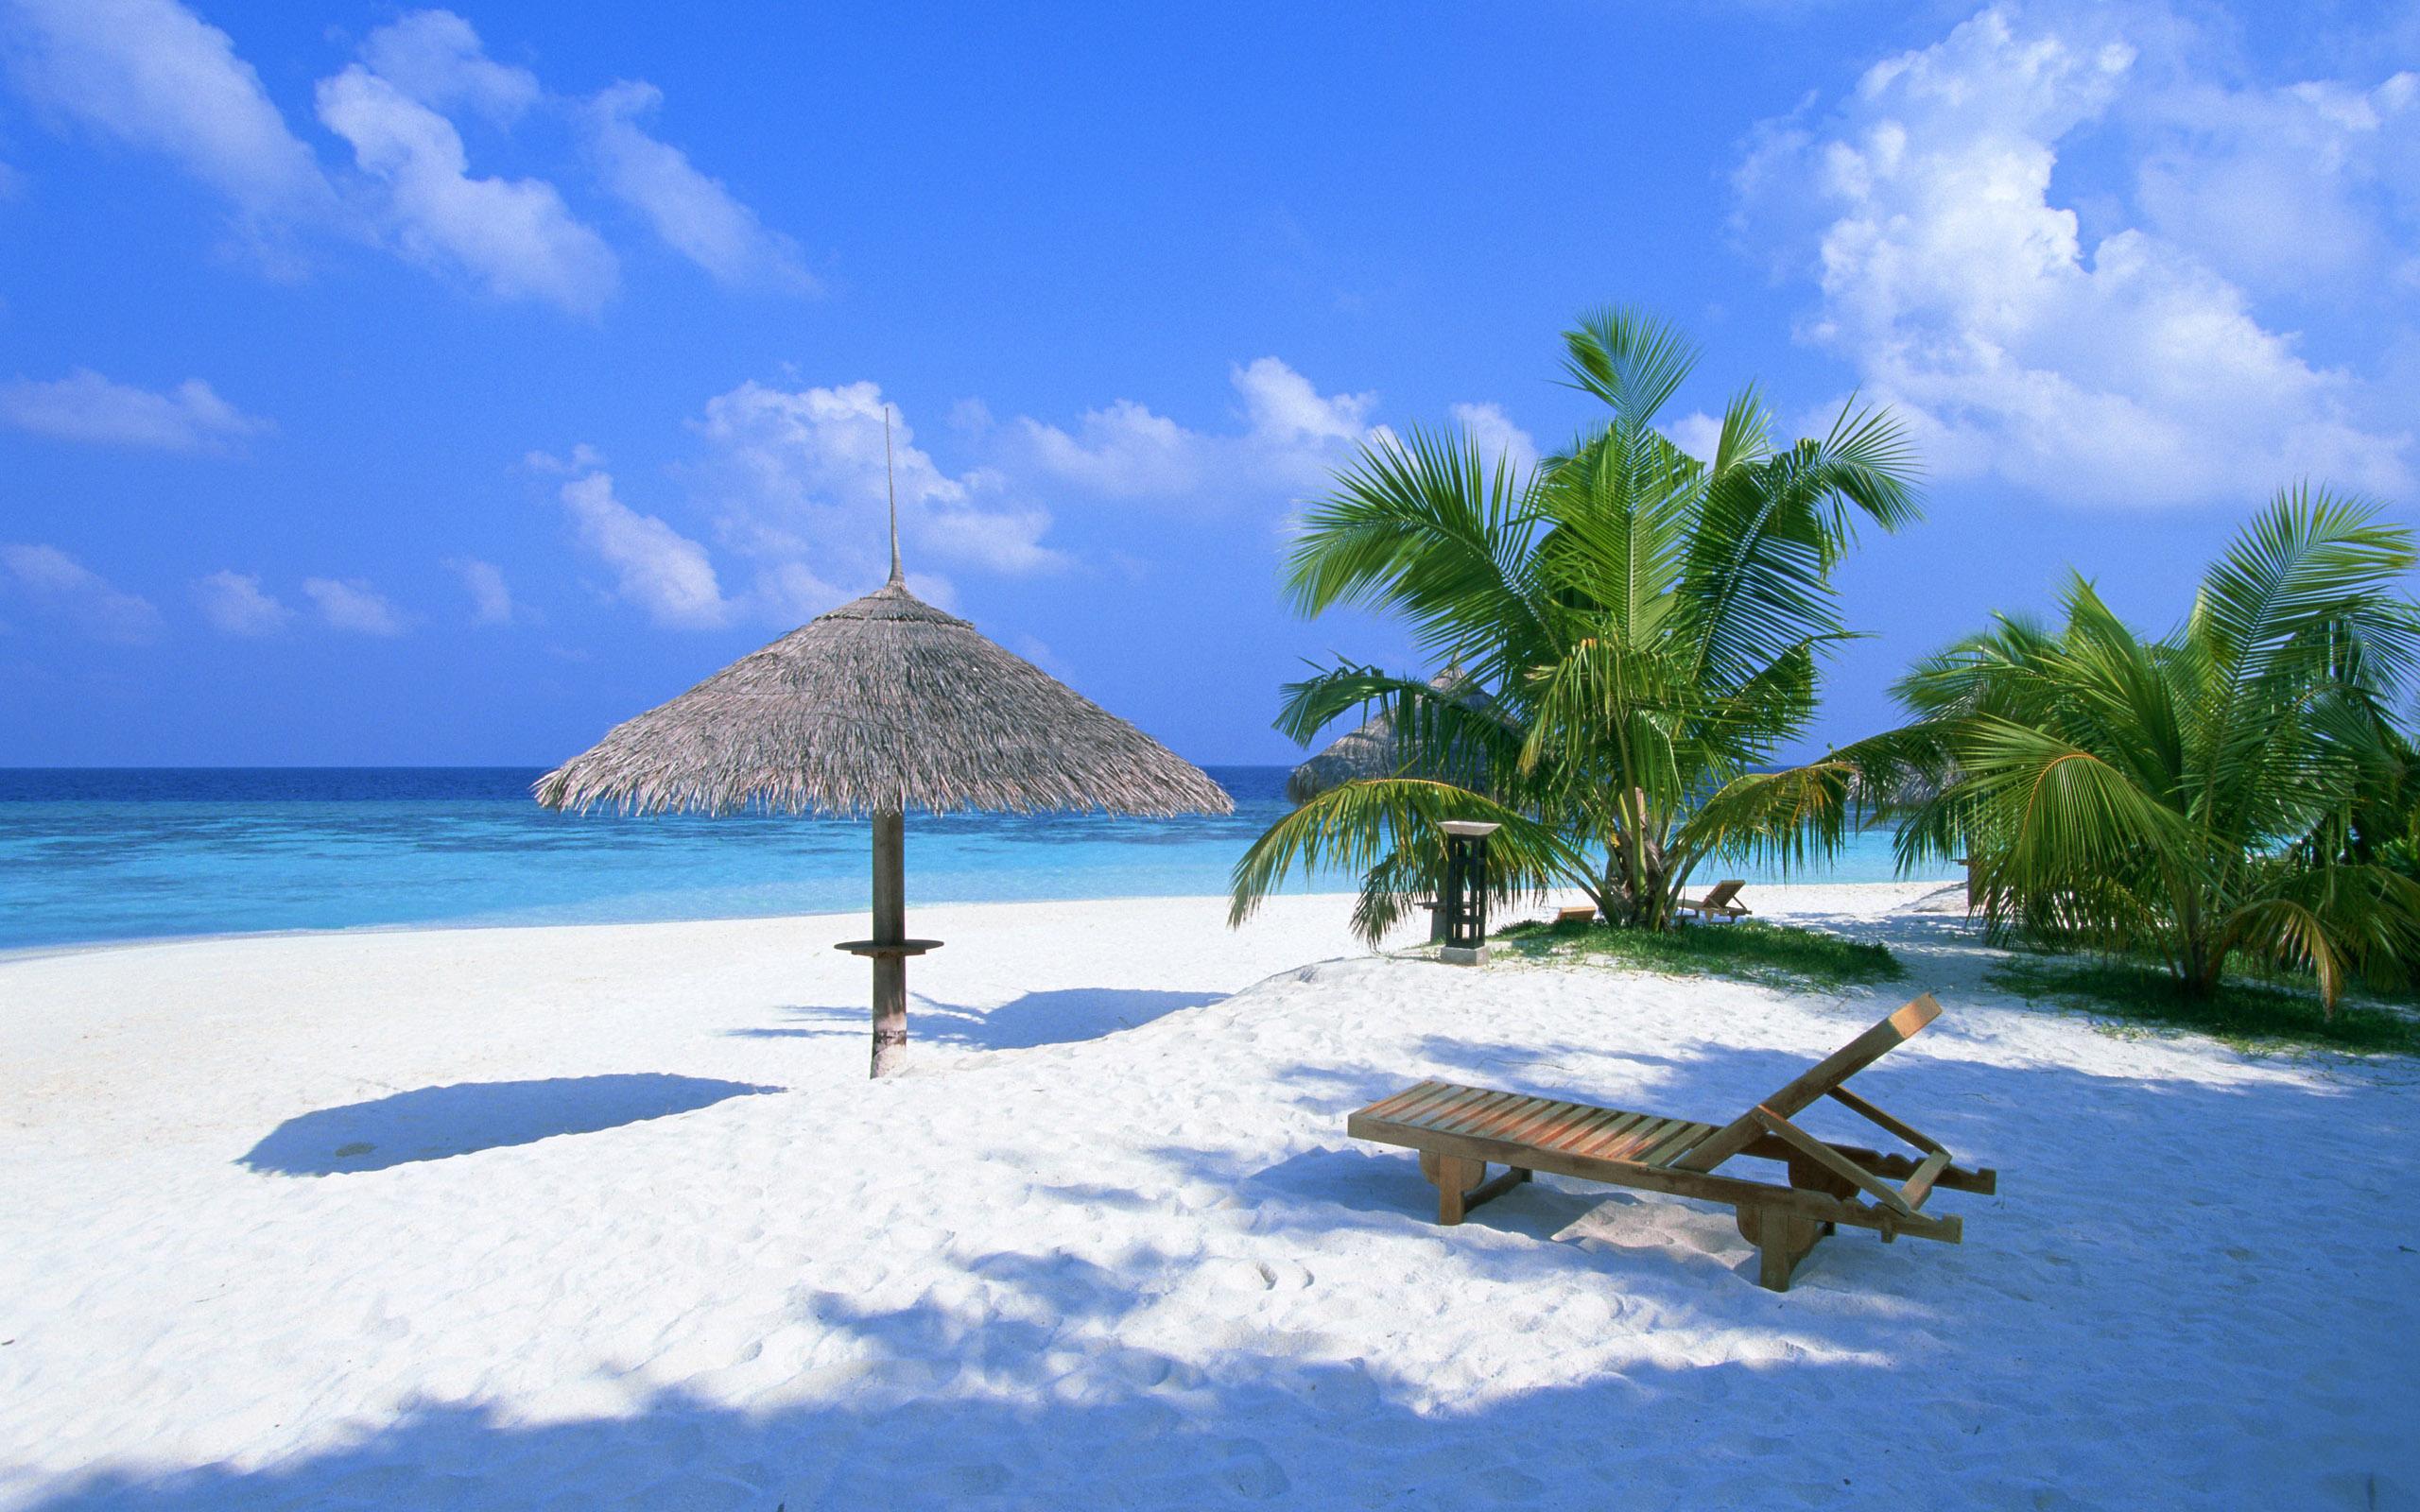 Island Desktop Backgrounds Maldives Island Desktop Background 2560x1600